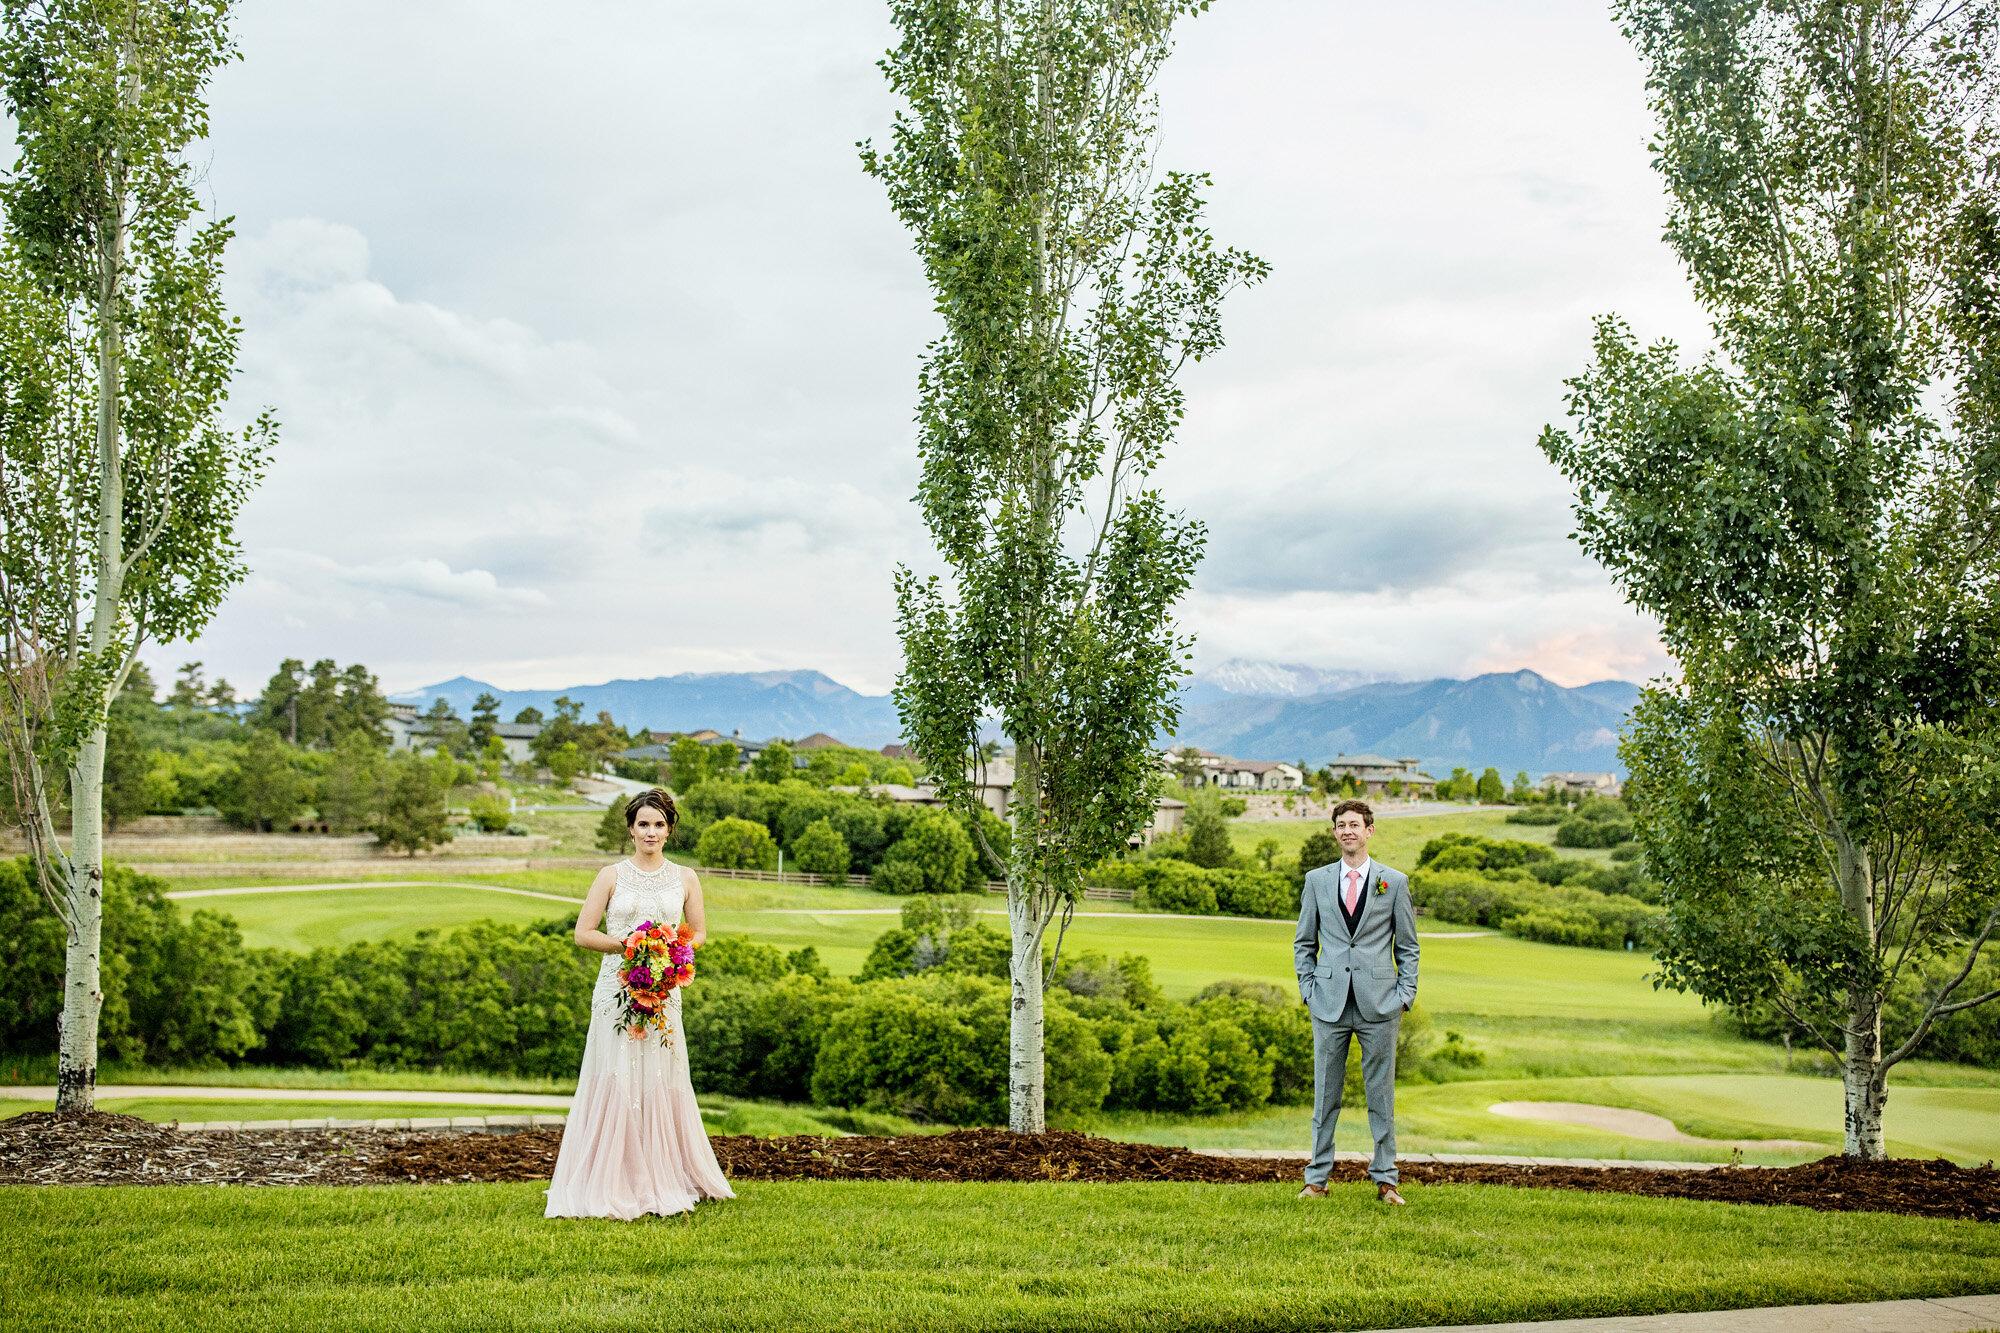 Seriously_Sabrina_Photography_Colorado_Springs_Club_at_Flying_Horse_Destination_Wedding_ODwyer86.jpg